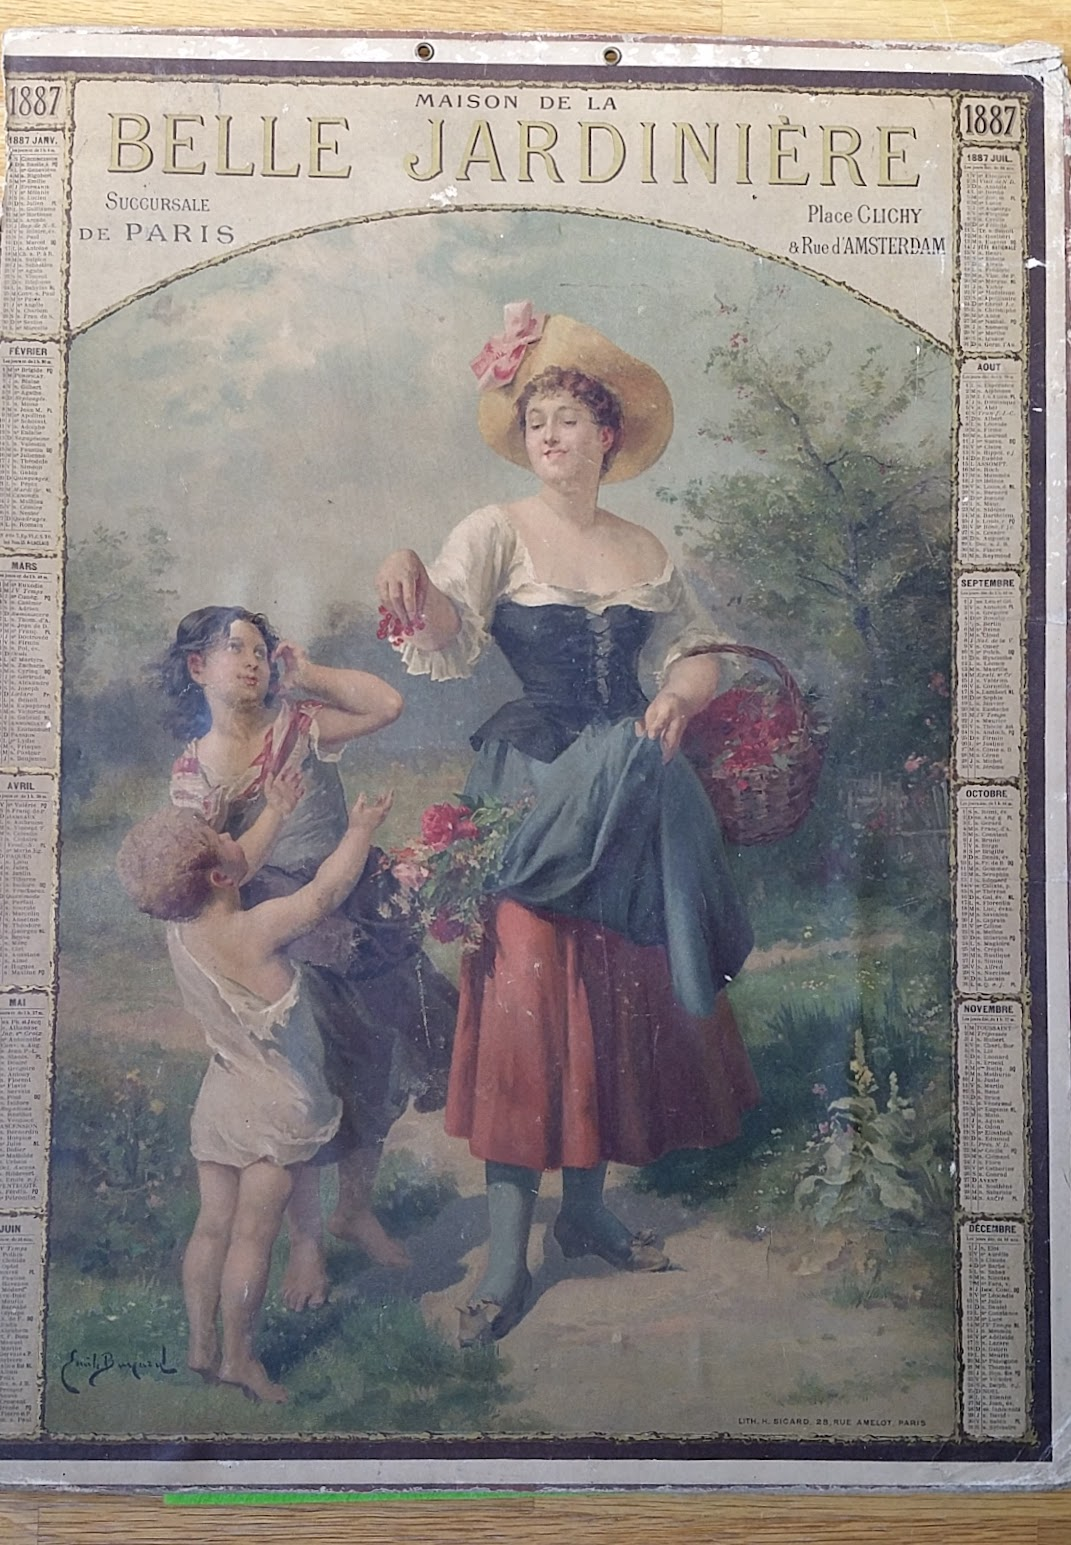 Kalender für Maison de la Belle Jardiniere, Paris - 1887 - Émile Bayard und Henri Sicard